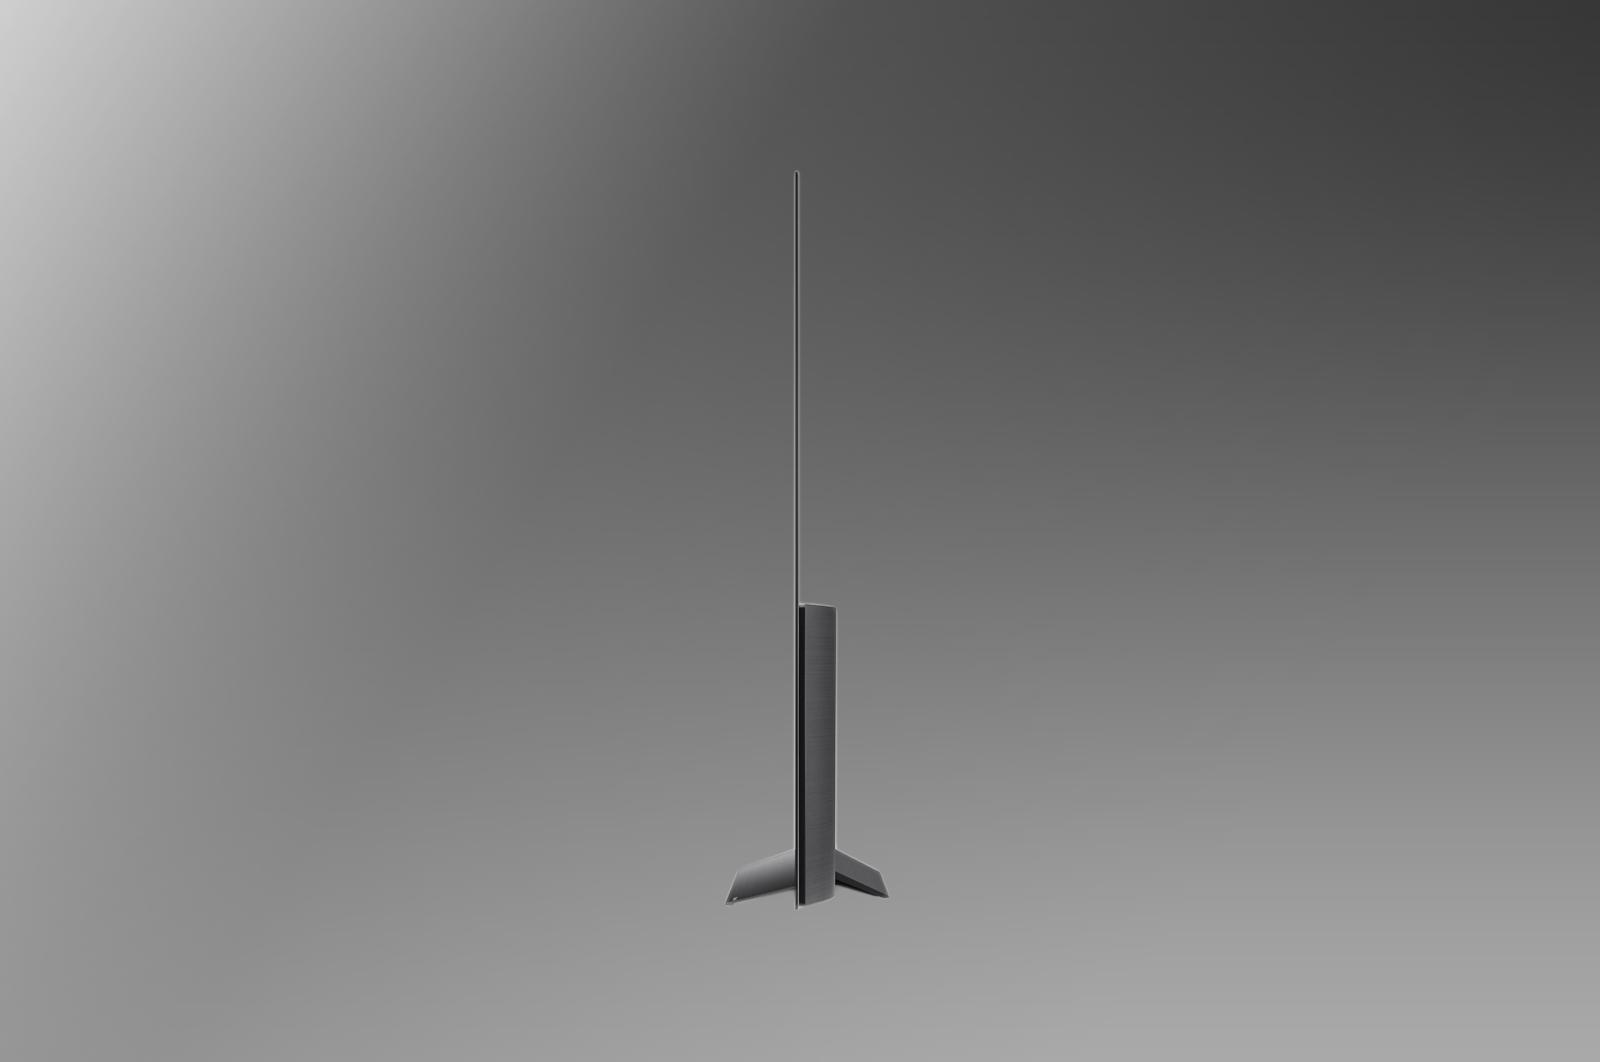 LG 55-inch OLED TV B8 | The Nexus